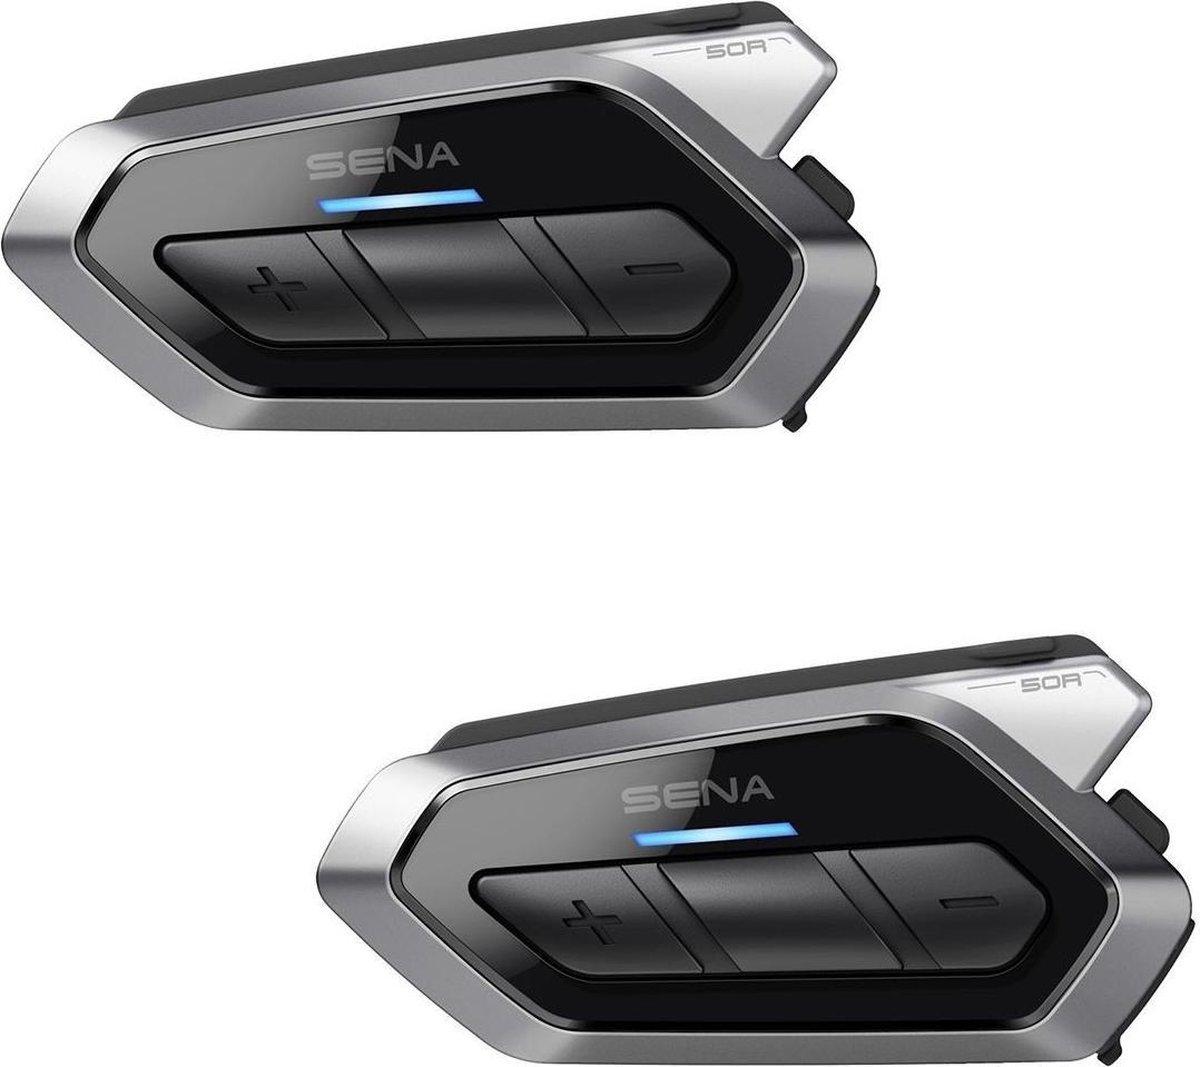 Sena 50R Mesh 2.0 dual bluetooth headset kopen